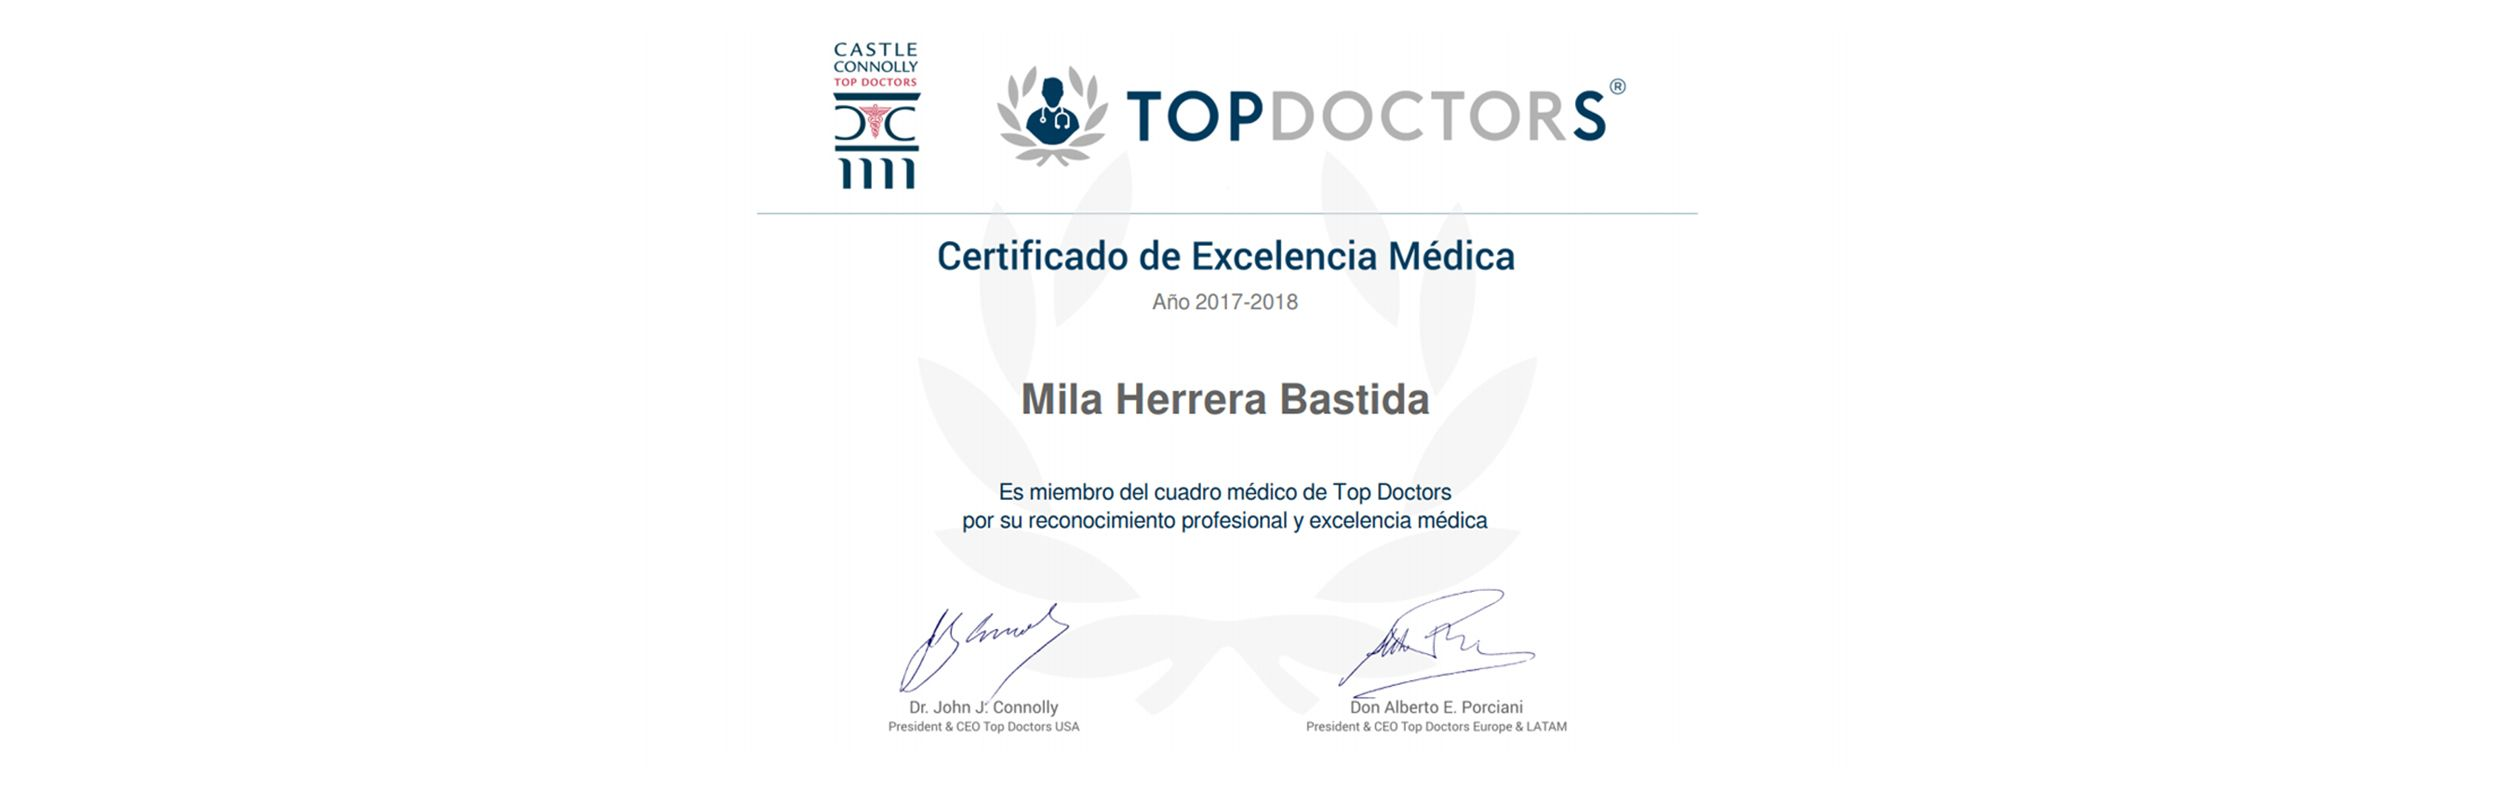 slide-topdoc-psicoclinica-1